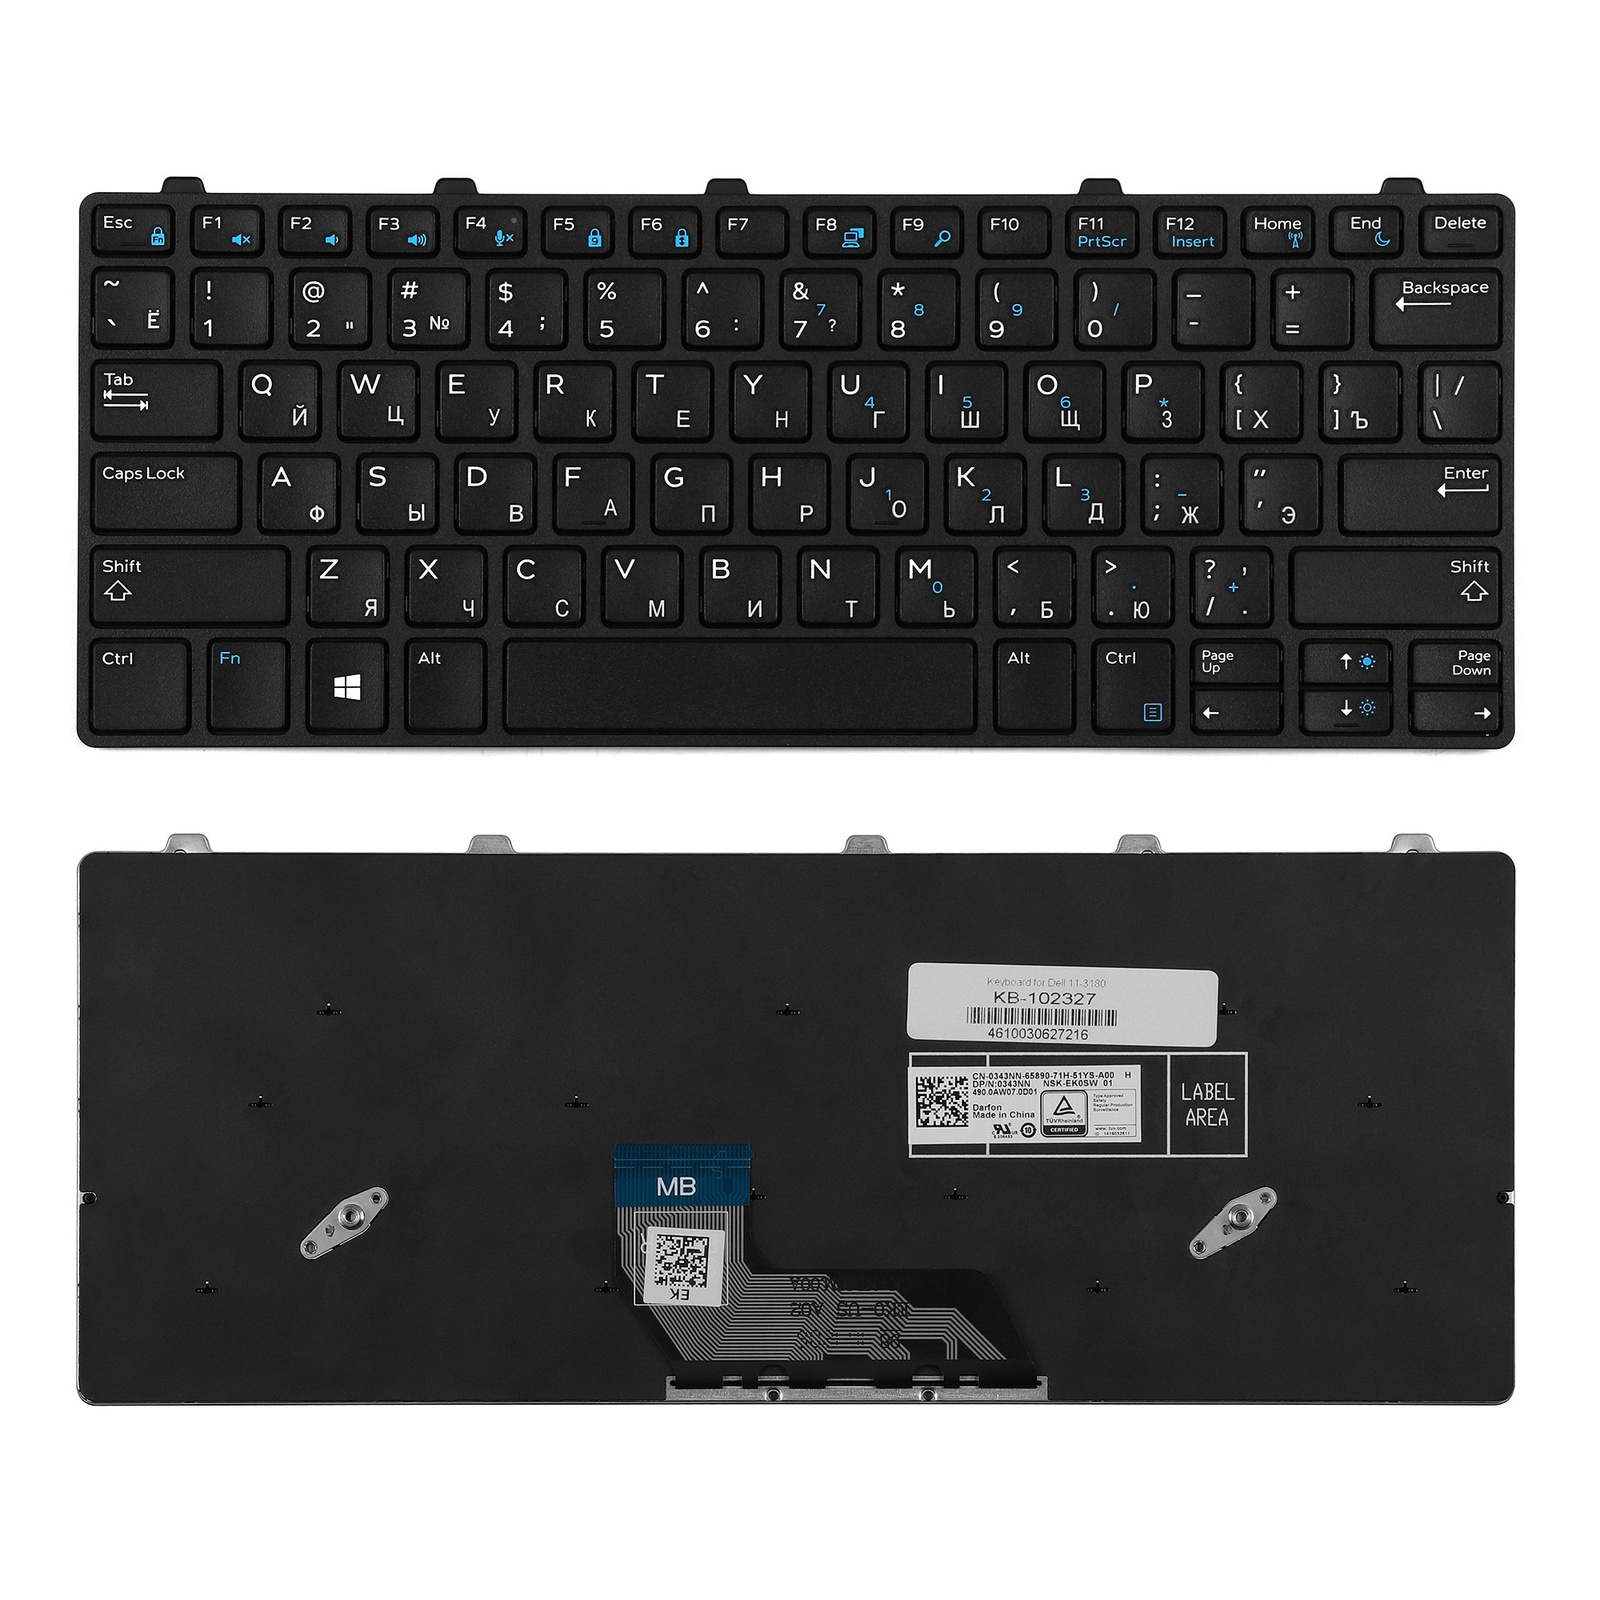 Клавиатура TopOn Dell Inspiron 11-3180, 3189 Series. Плоский Enter. С рамкой. PN: 5XVF4, HNXPM, PK131X23A00, KB-102327, черный аккумулятор для ноутбука dell inspiron 1520 1521 1720 1721 530s vostro 1500 1700 series 4400мач 11 1v topon top 1520